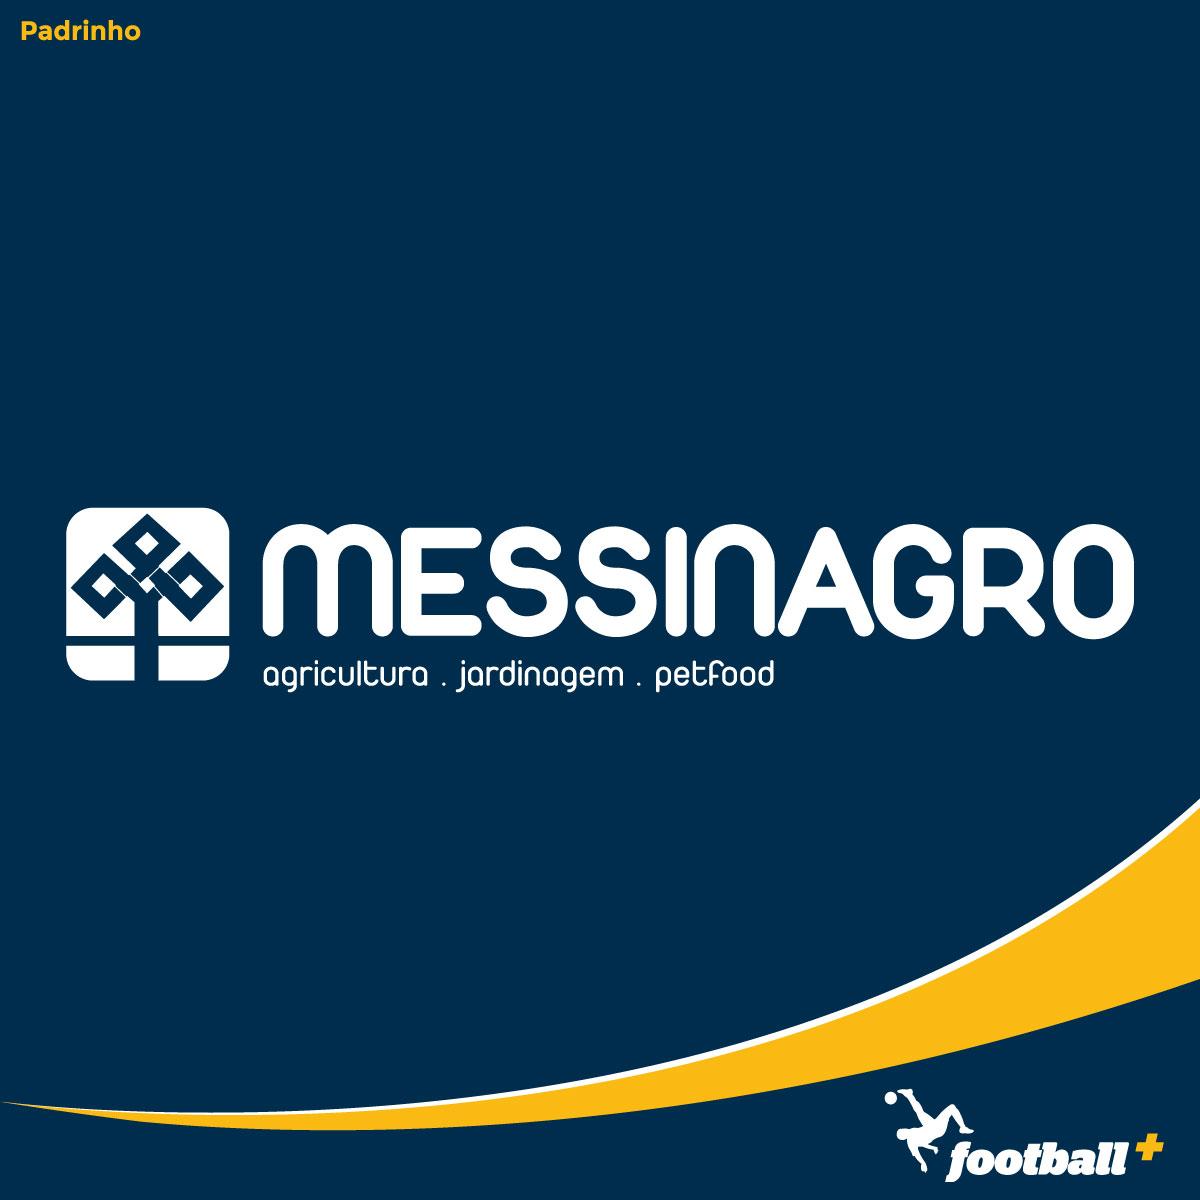 Messinagro